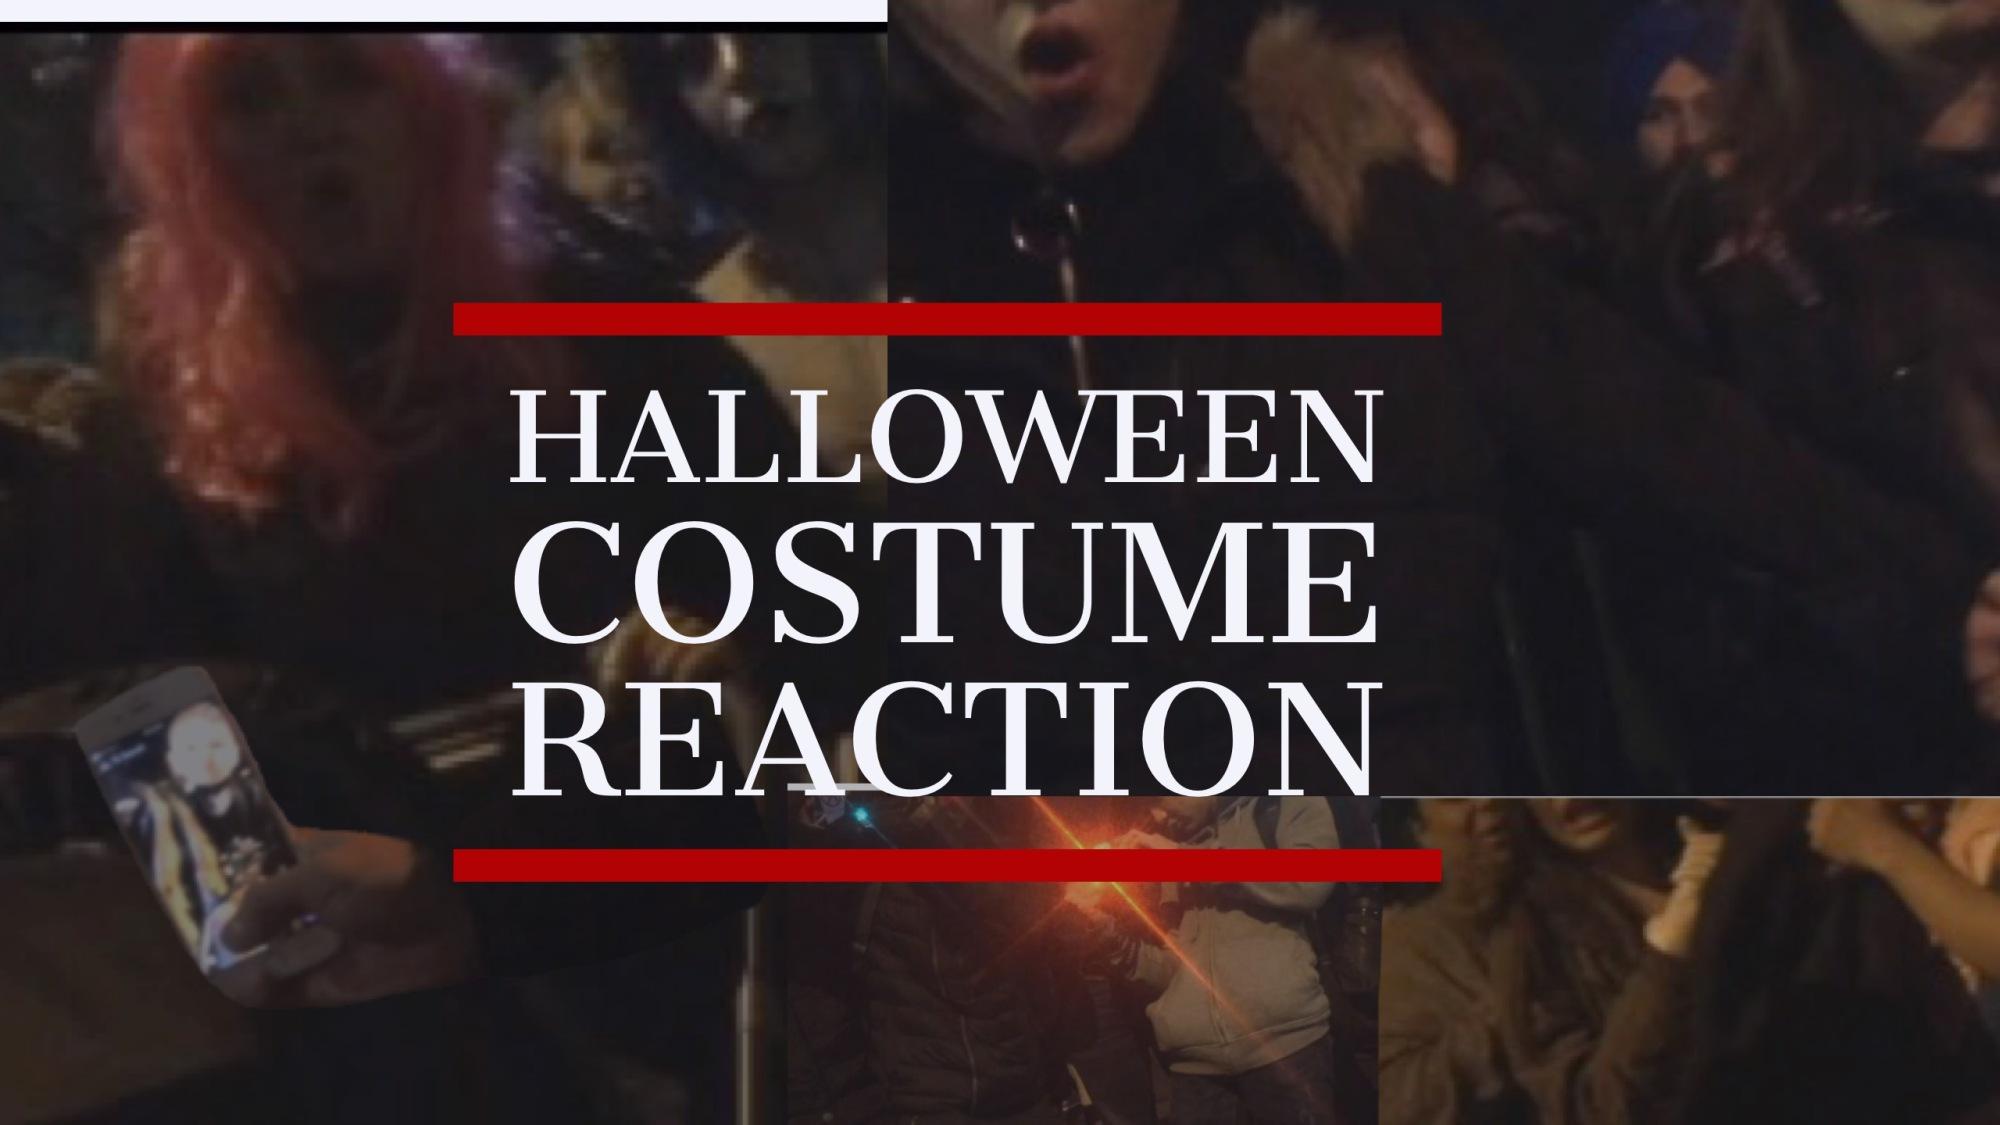 Halloween 2017 costume